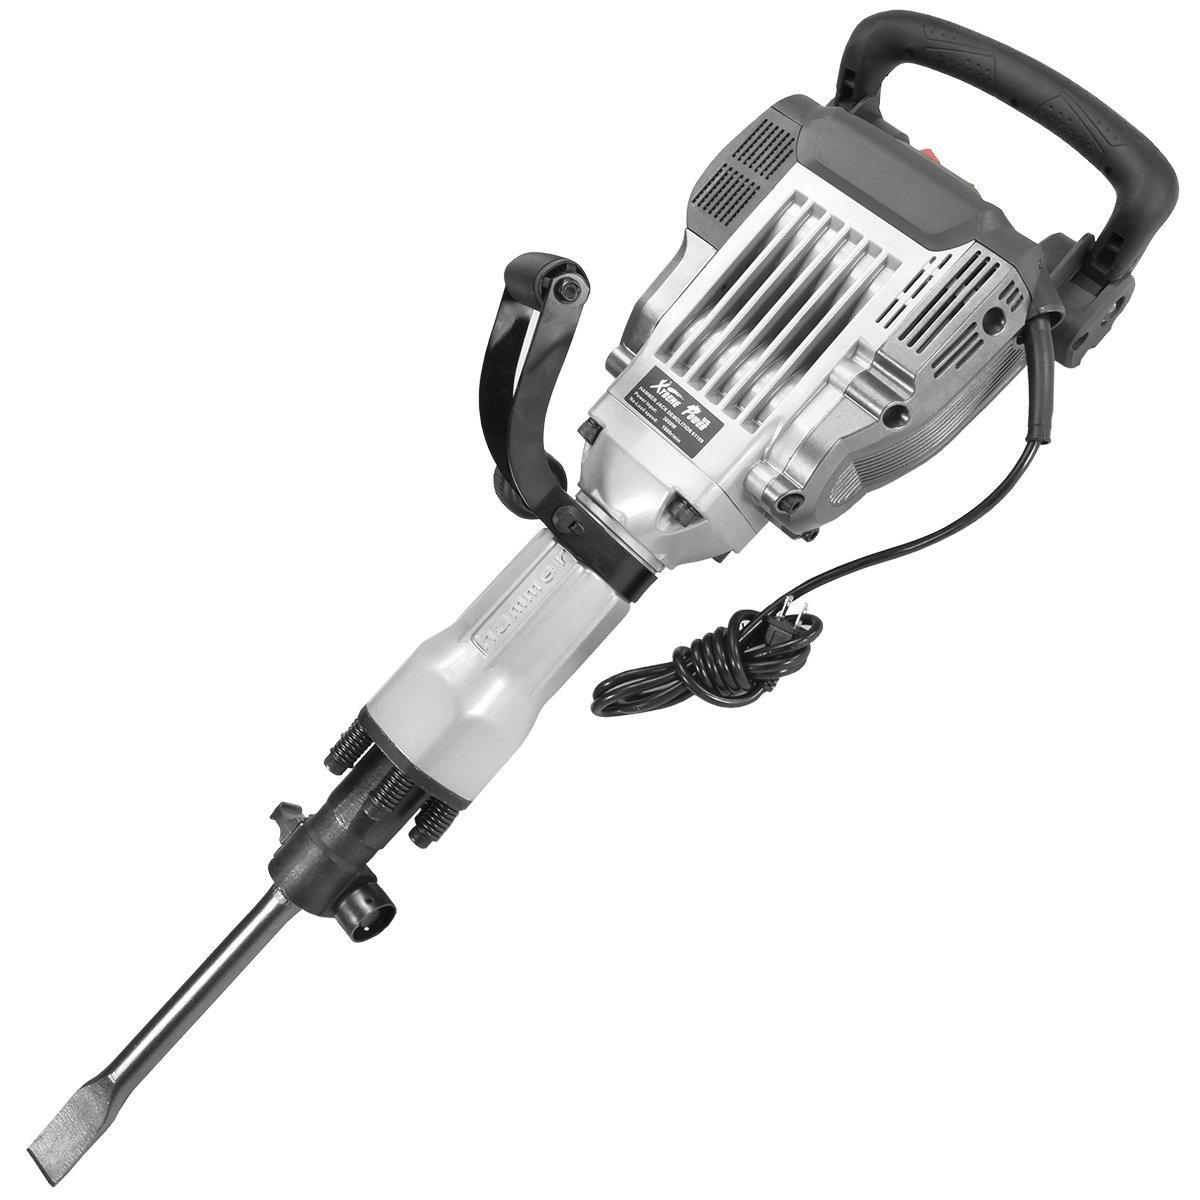 XtremepowerUS 3600W Heavy Duty Electric Demolition Jack Hammer Concrete Breaker (2) Chisel & Point Chisel Bit Hand Gloves w/Case